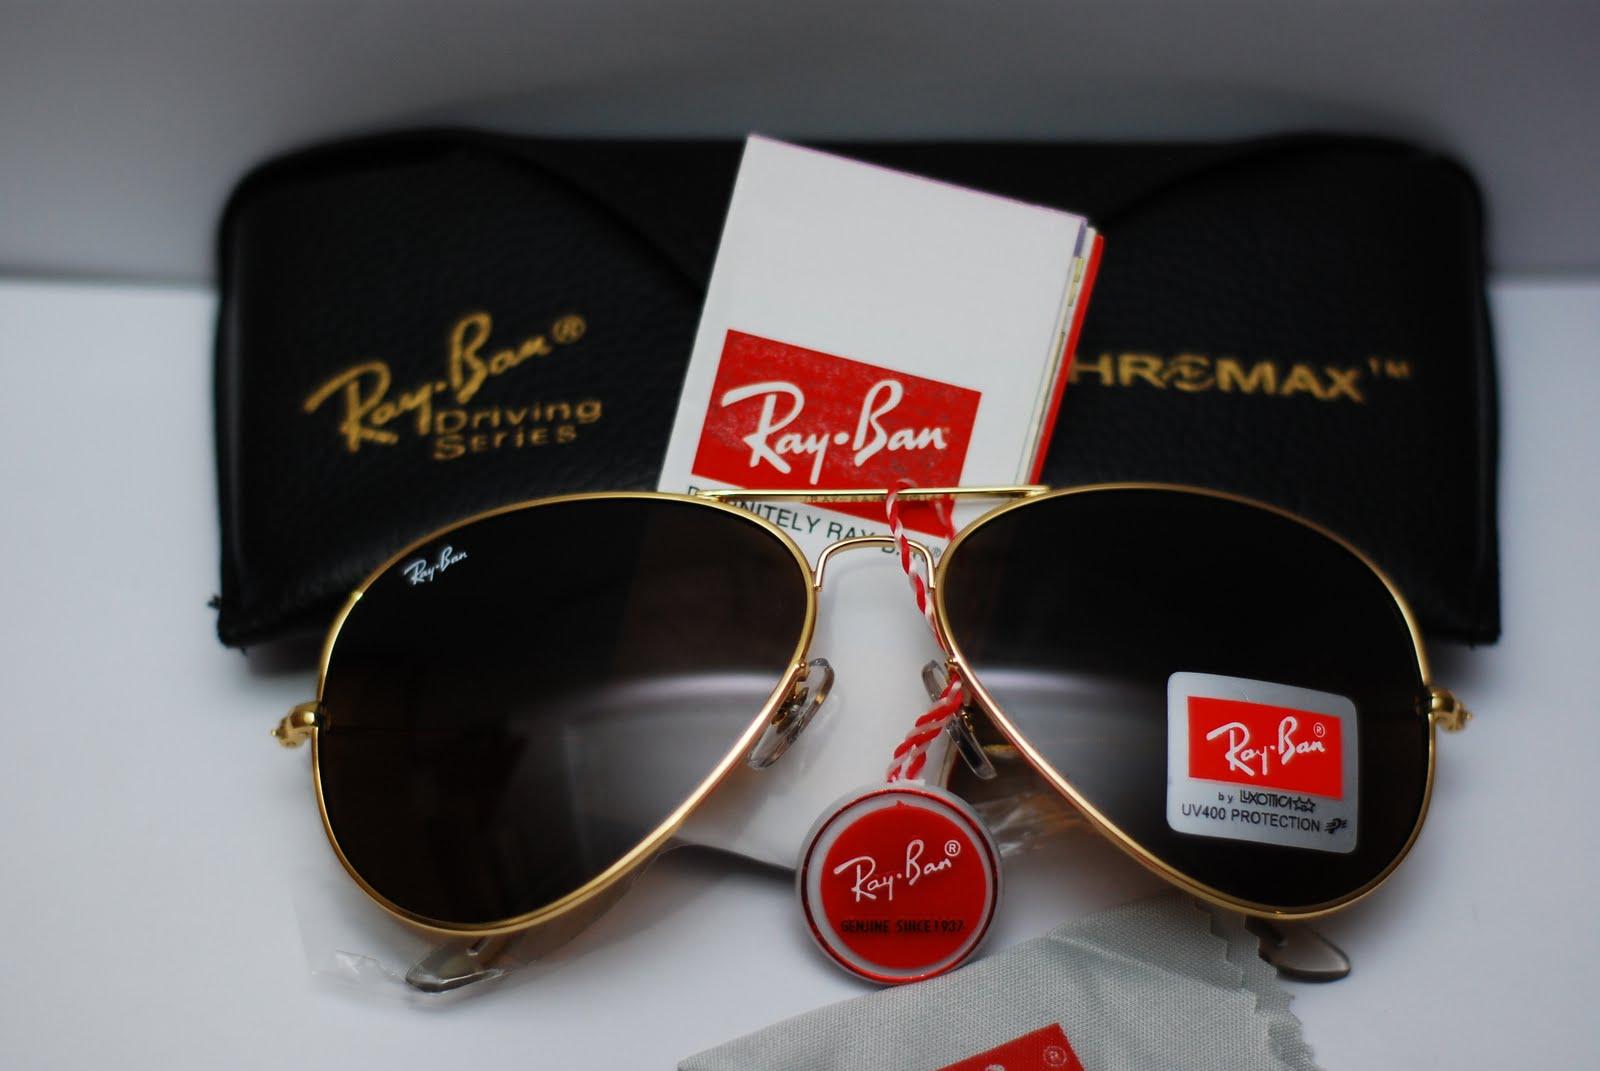 Ray Ban Aviator Gold